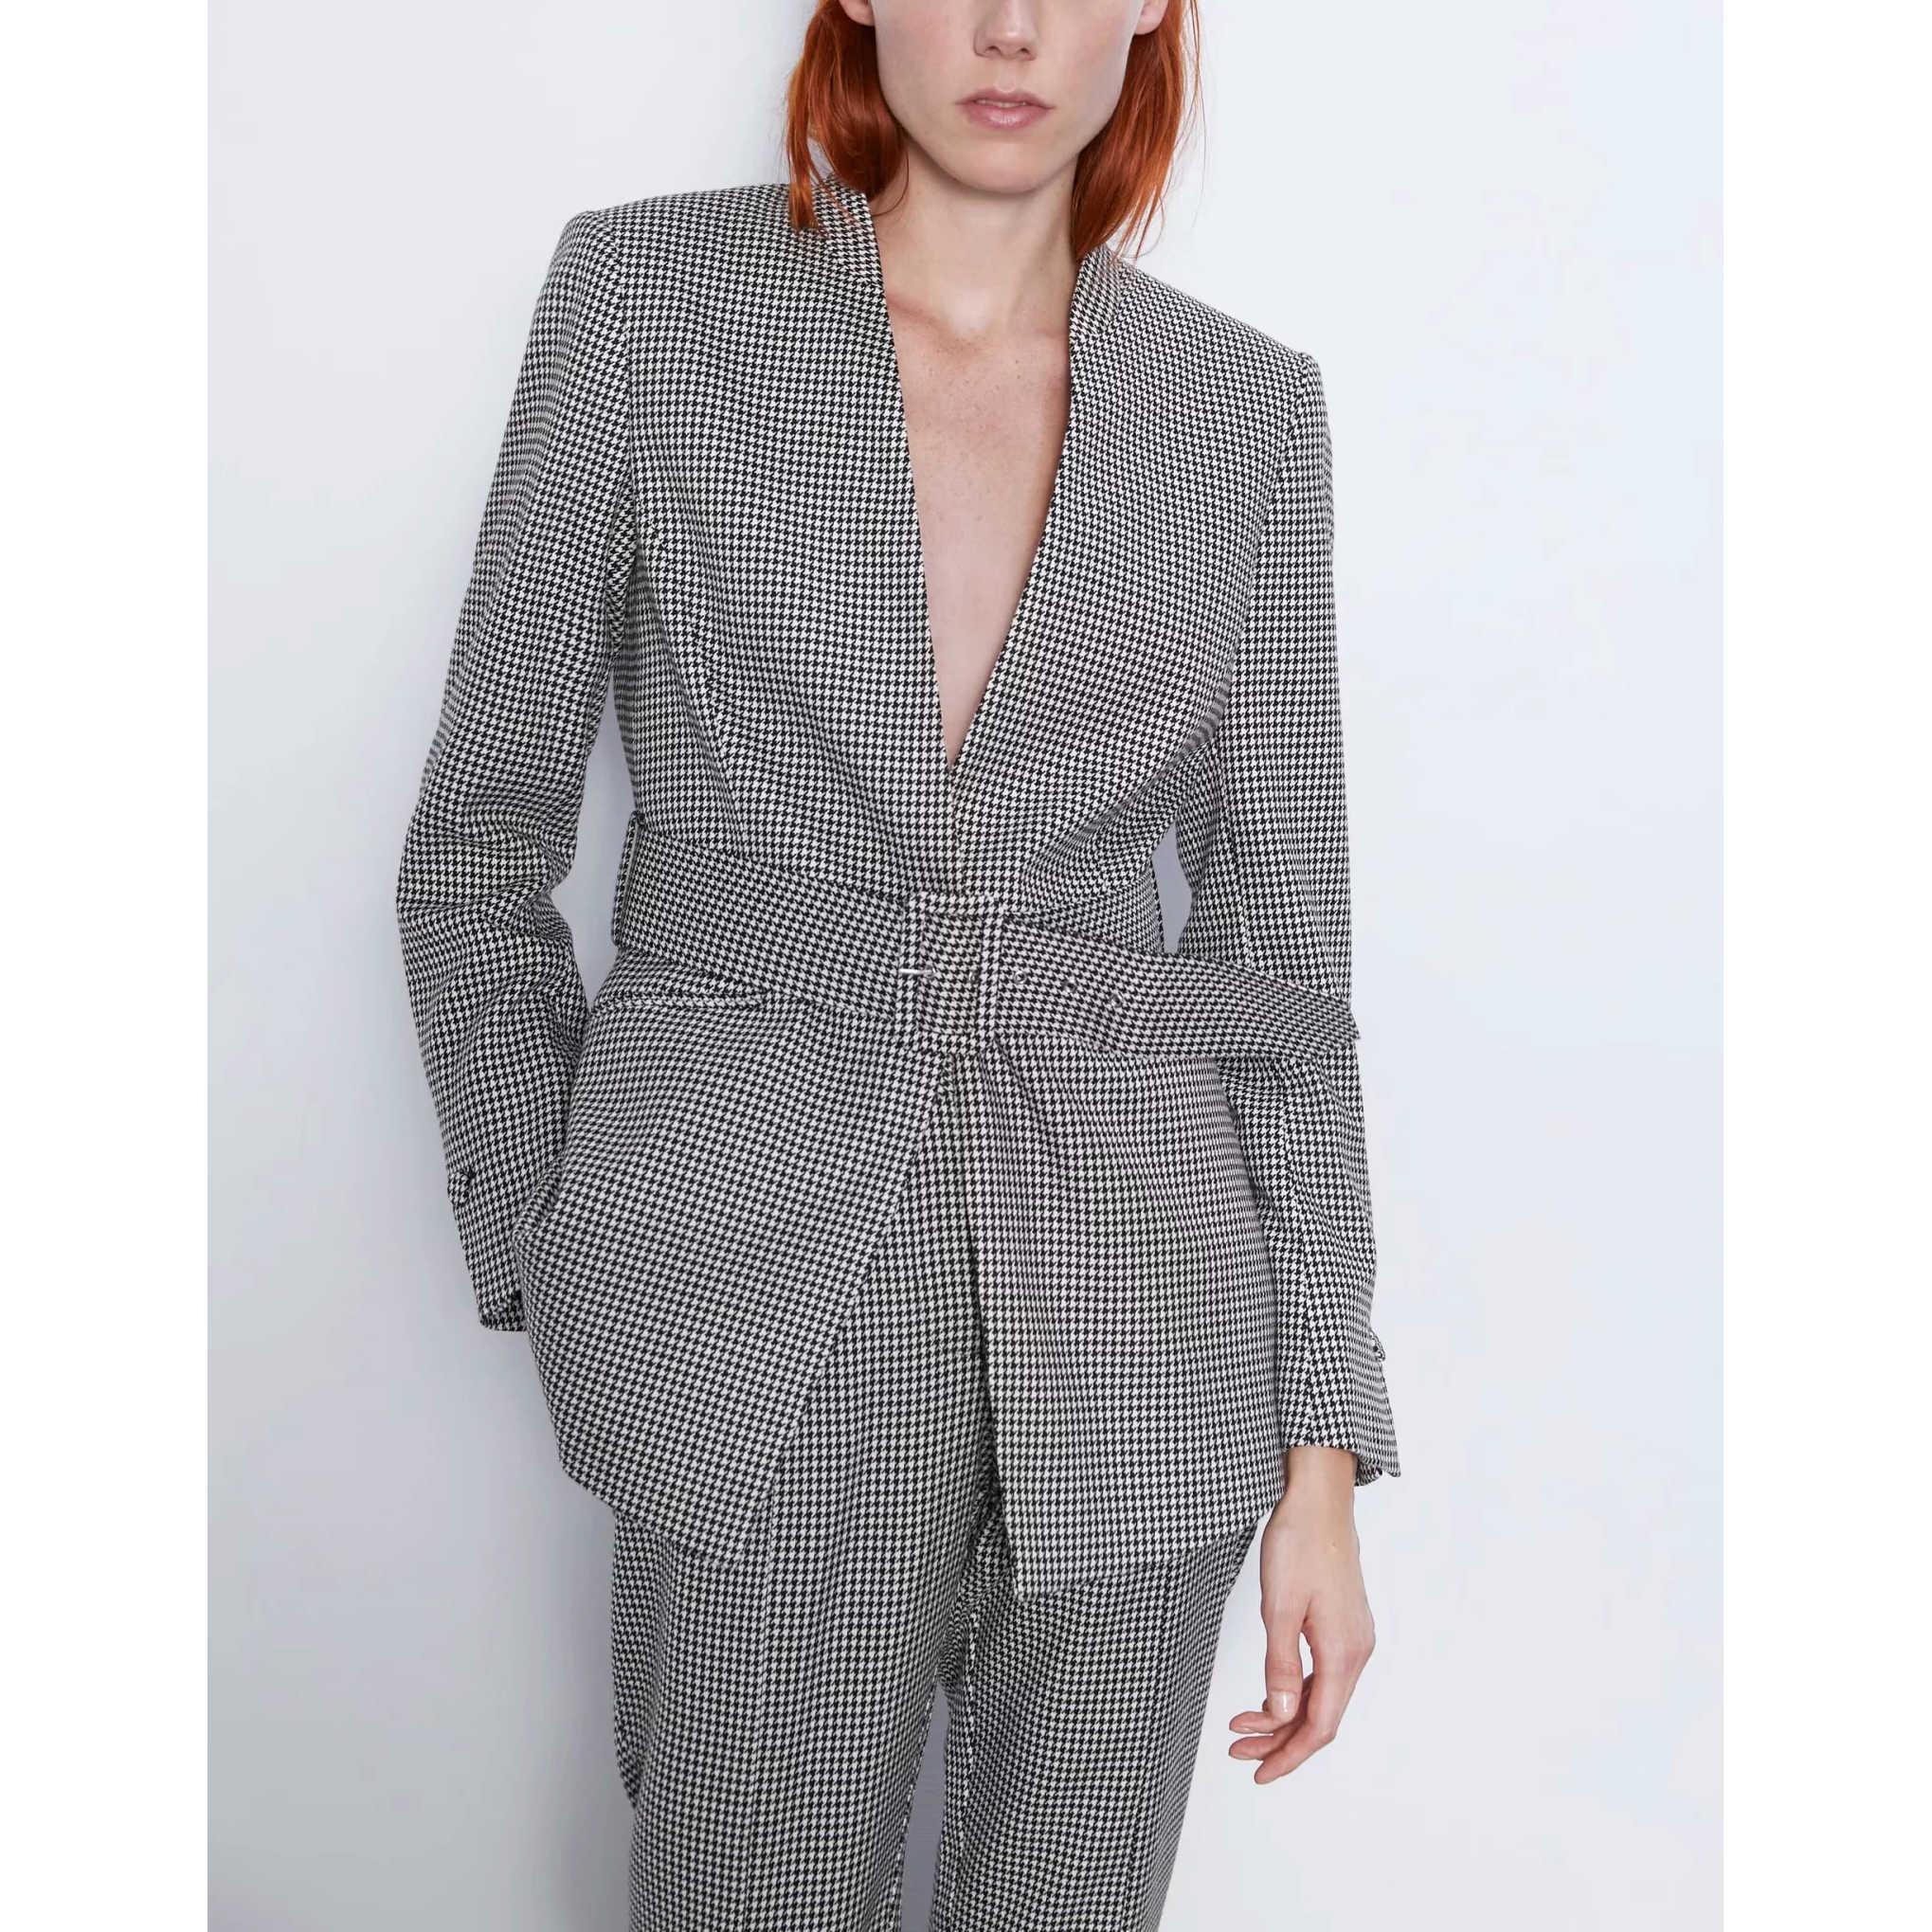 Casual plaid suits mujer blazer-set cintura manga completa superior y pantalones acampanados elegante Oficina lady coat femme suits